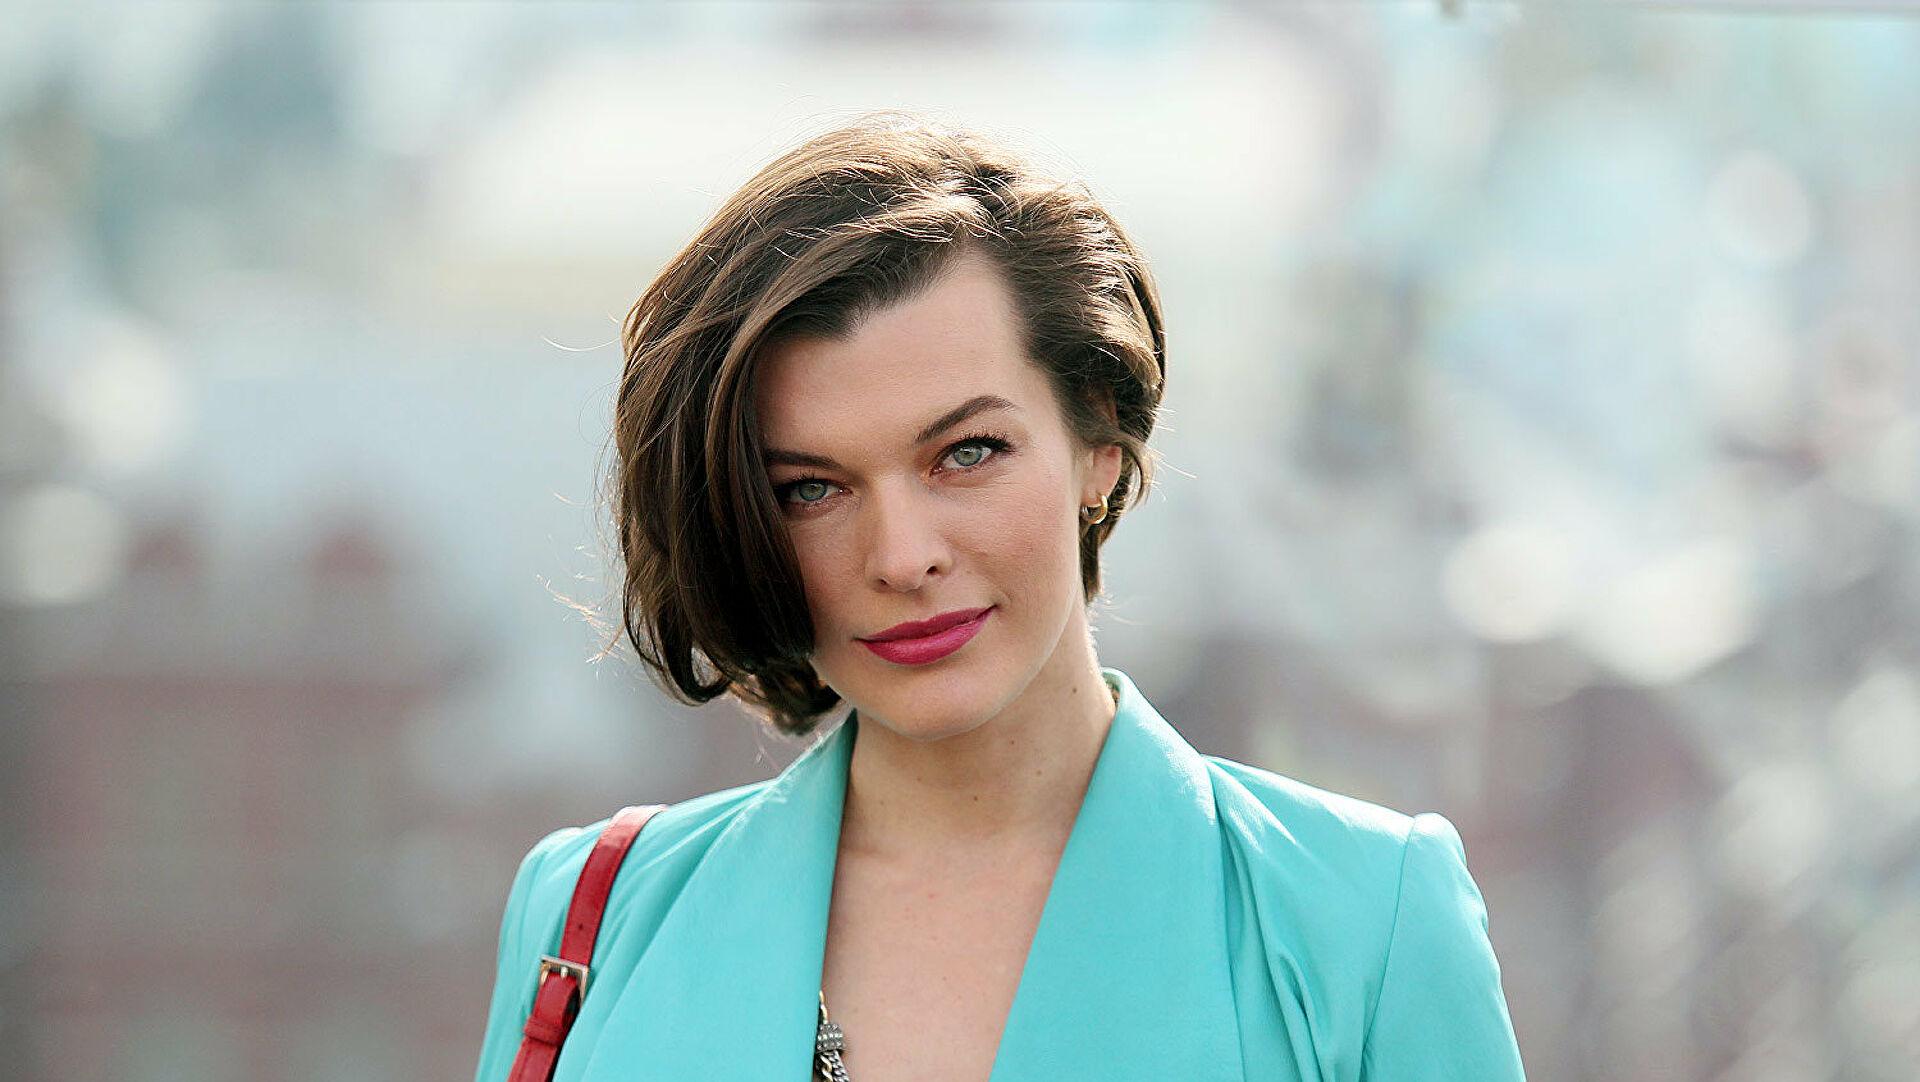 Милла Йовович иПолУ.С.Андерсон станут гостями Comic Con Russia Online 2020